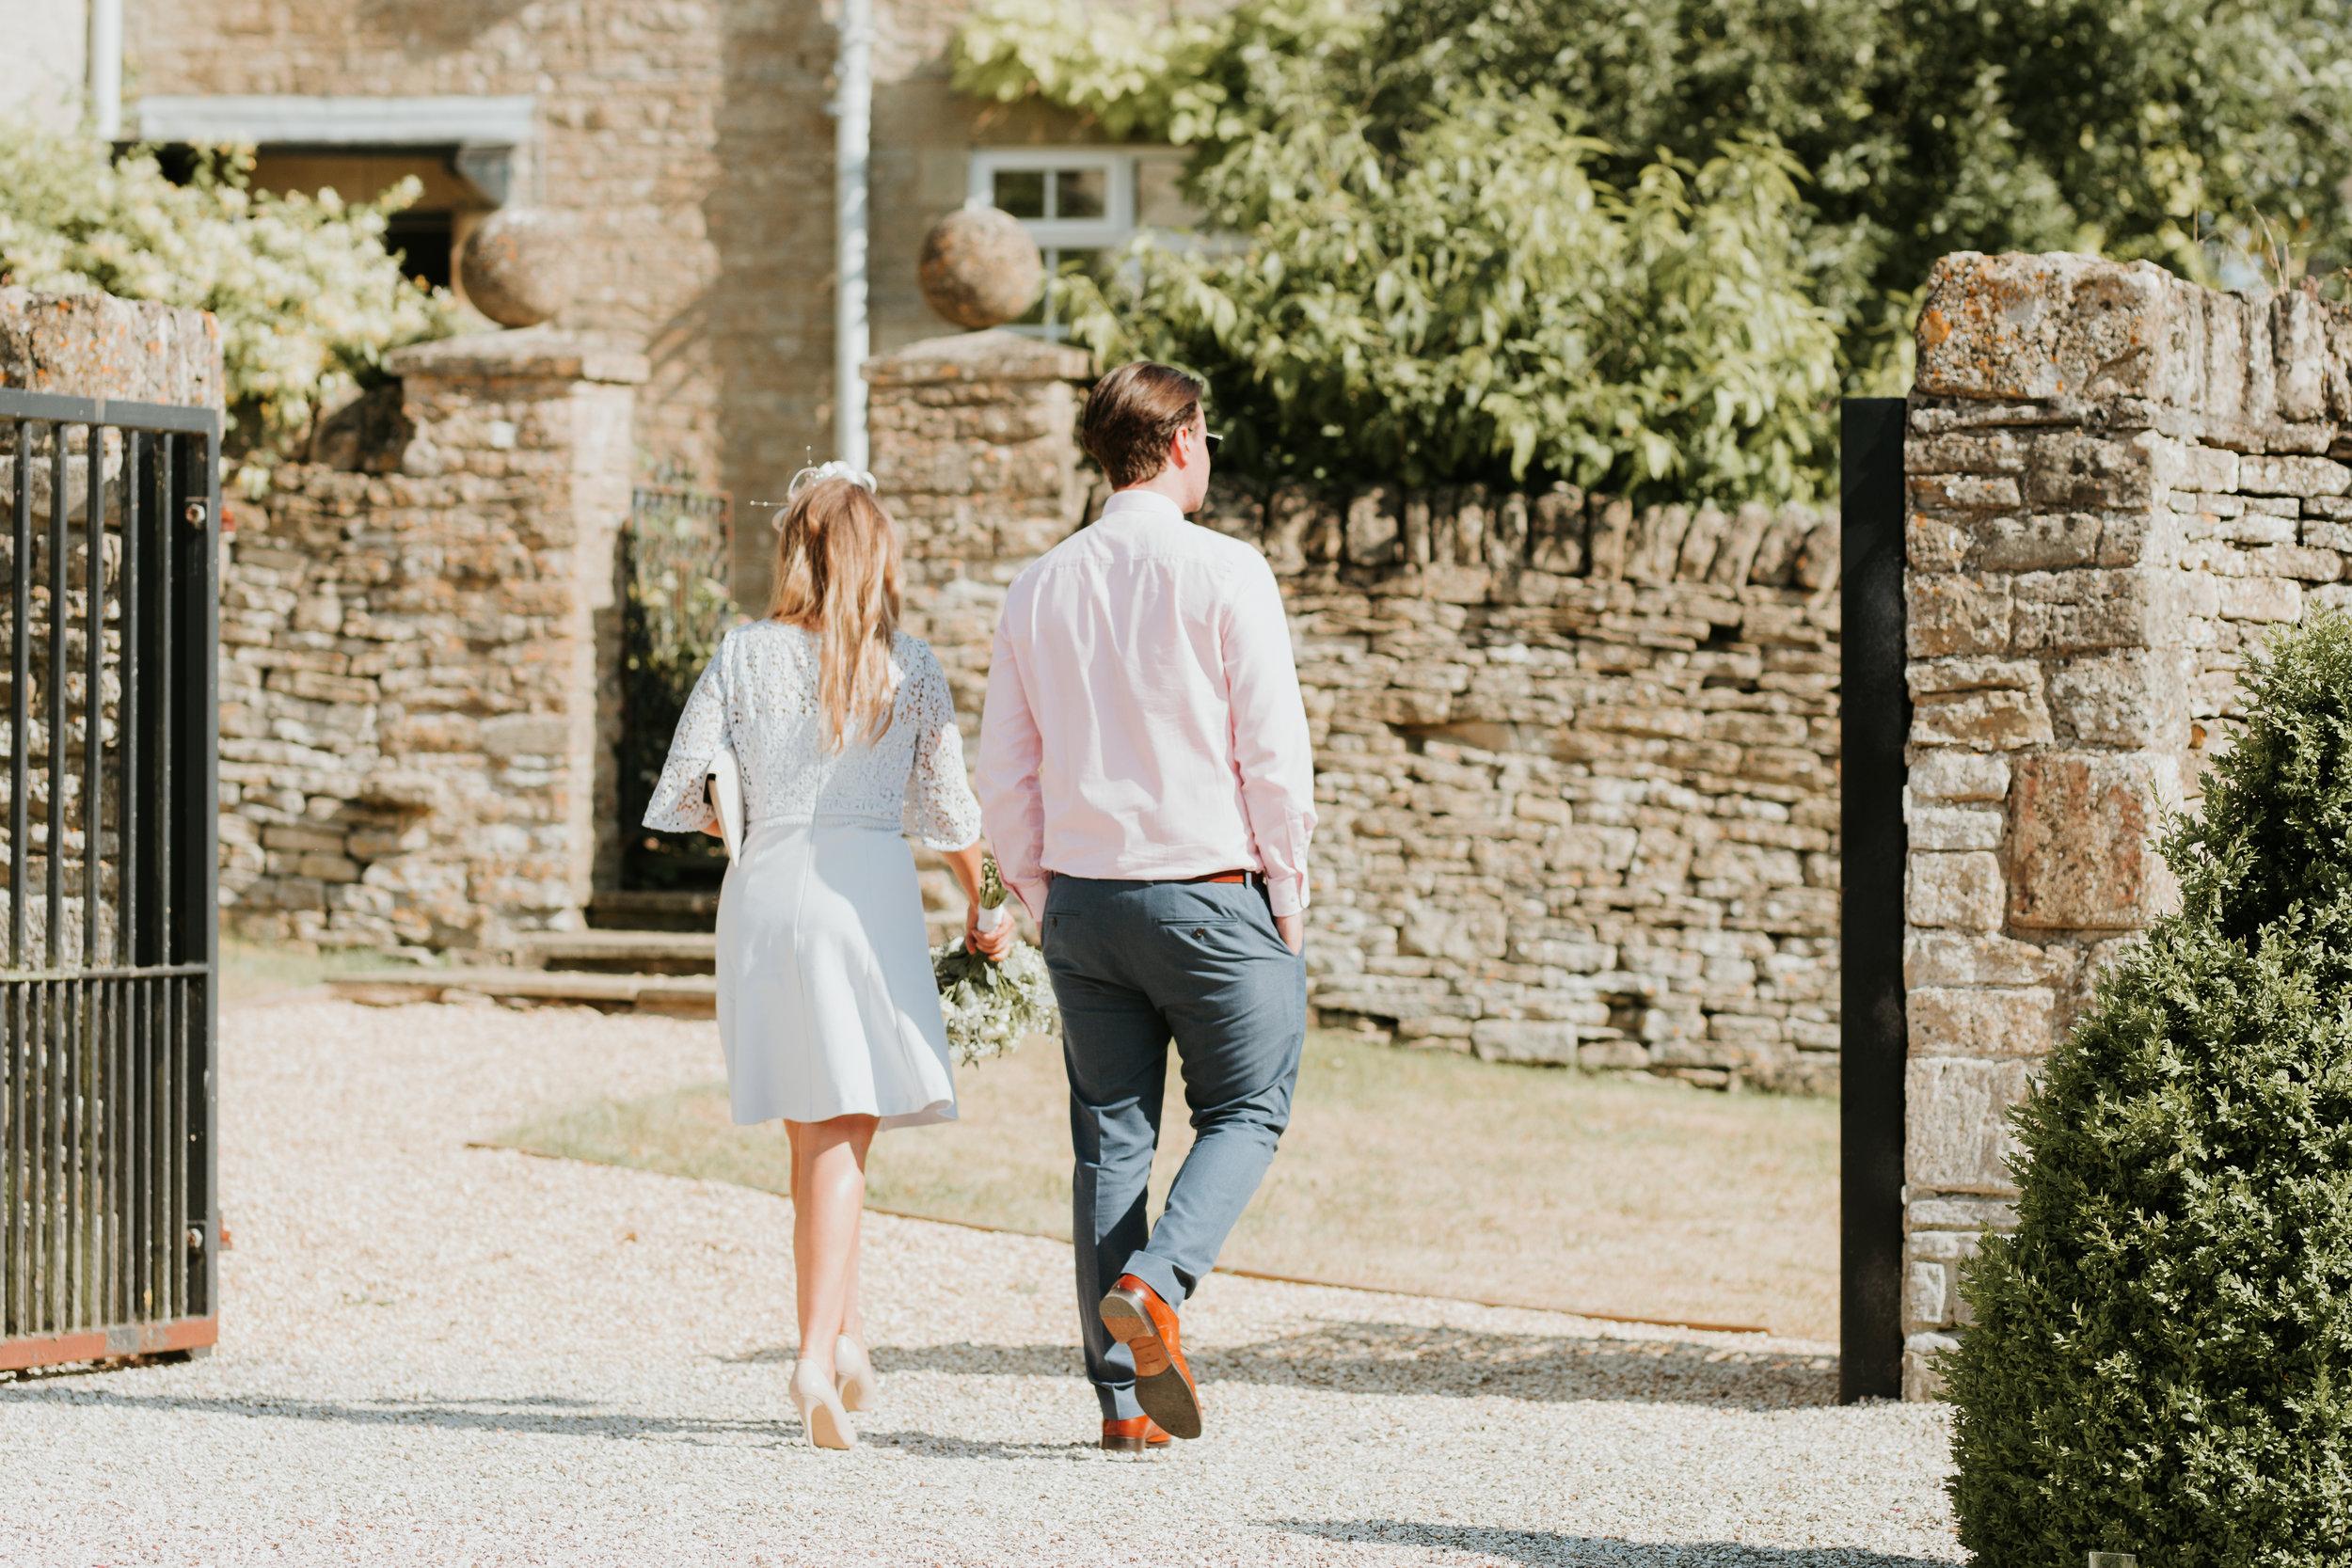 Oxfordshire-wedding-photographer-58.jpg